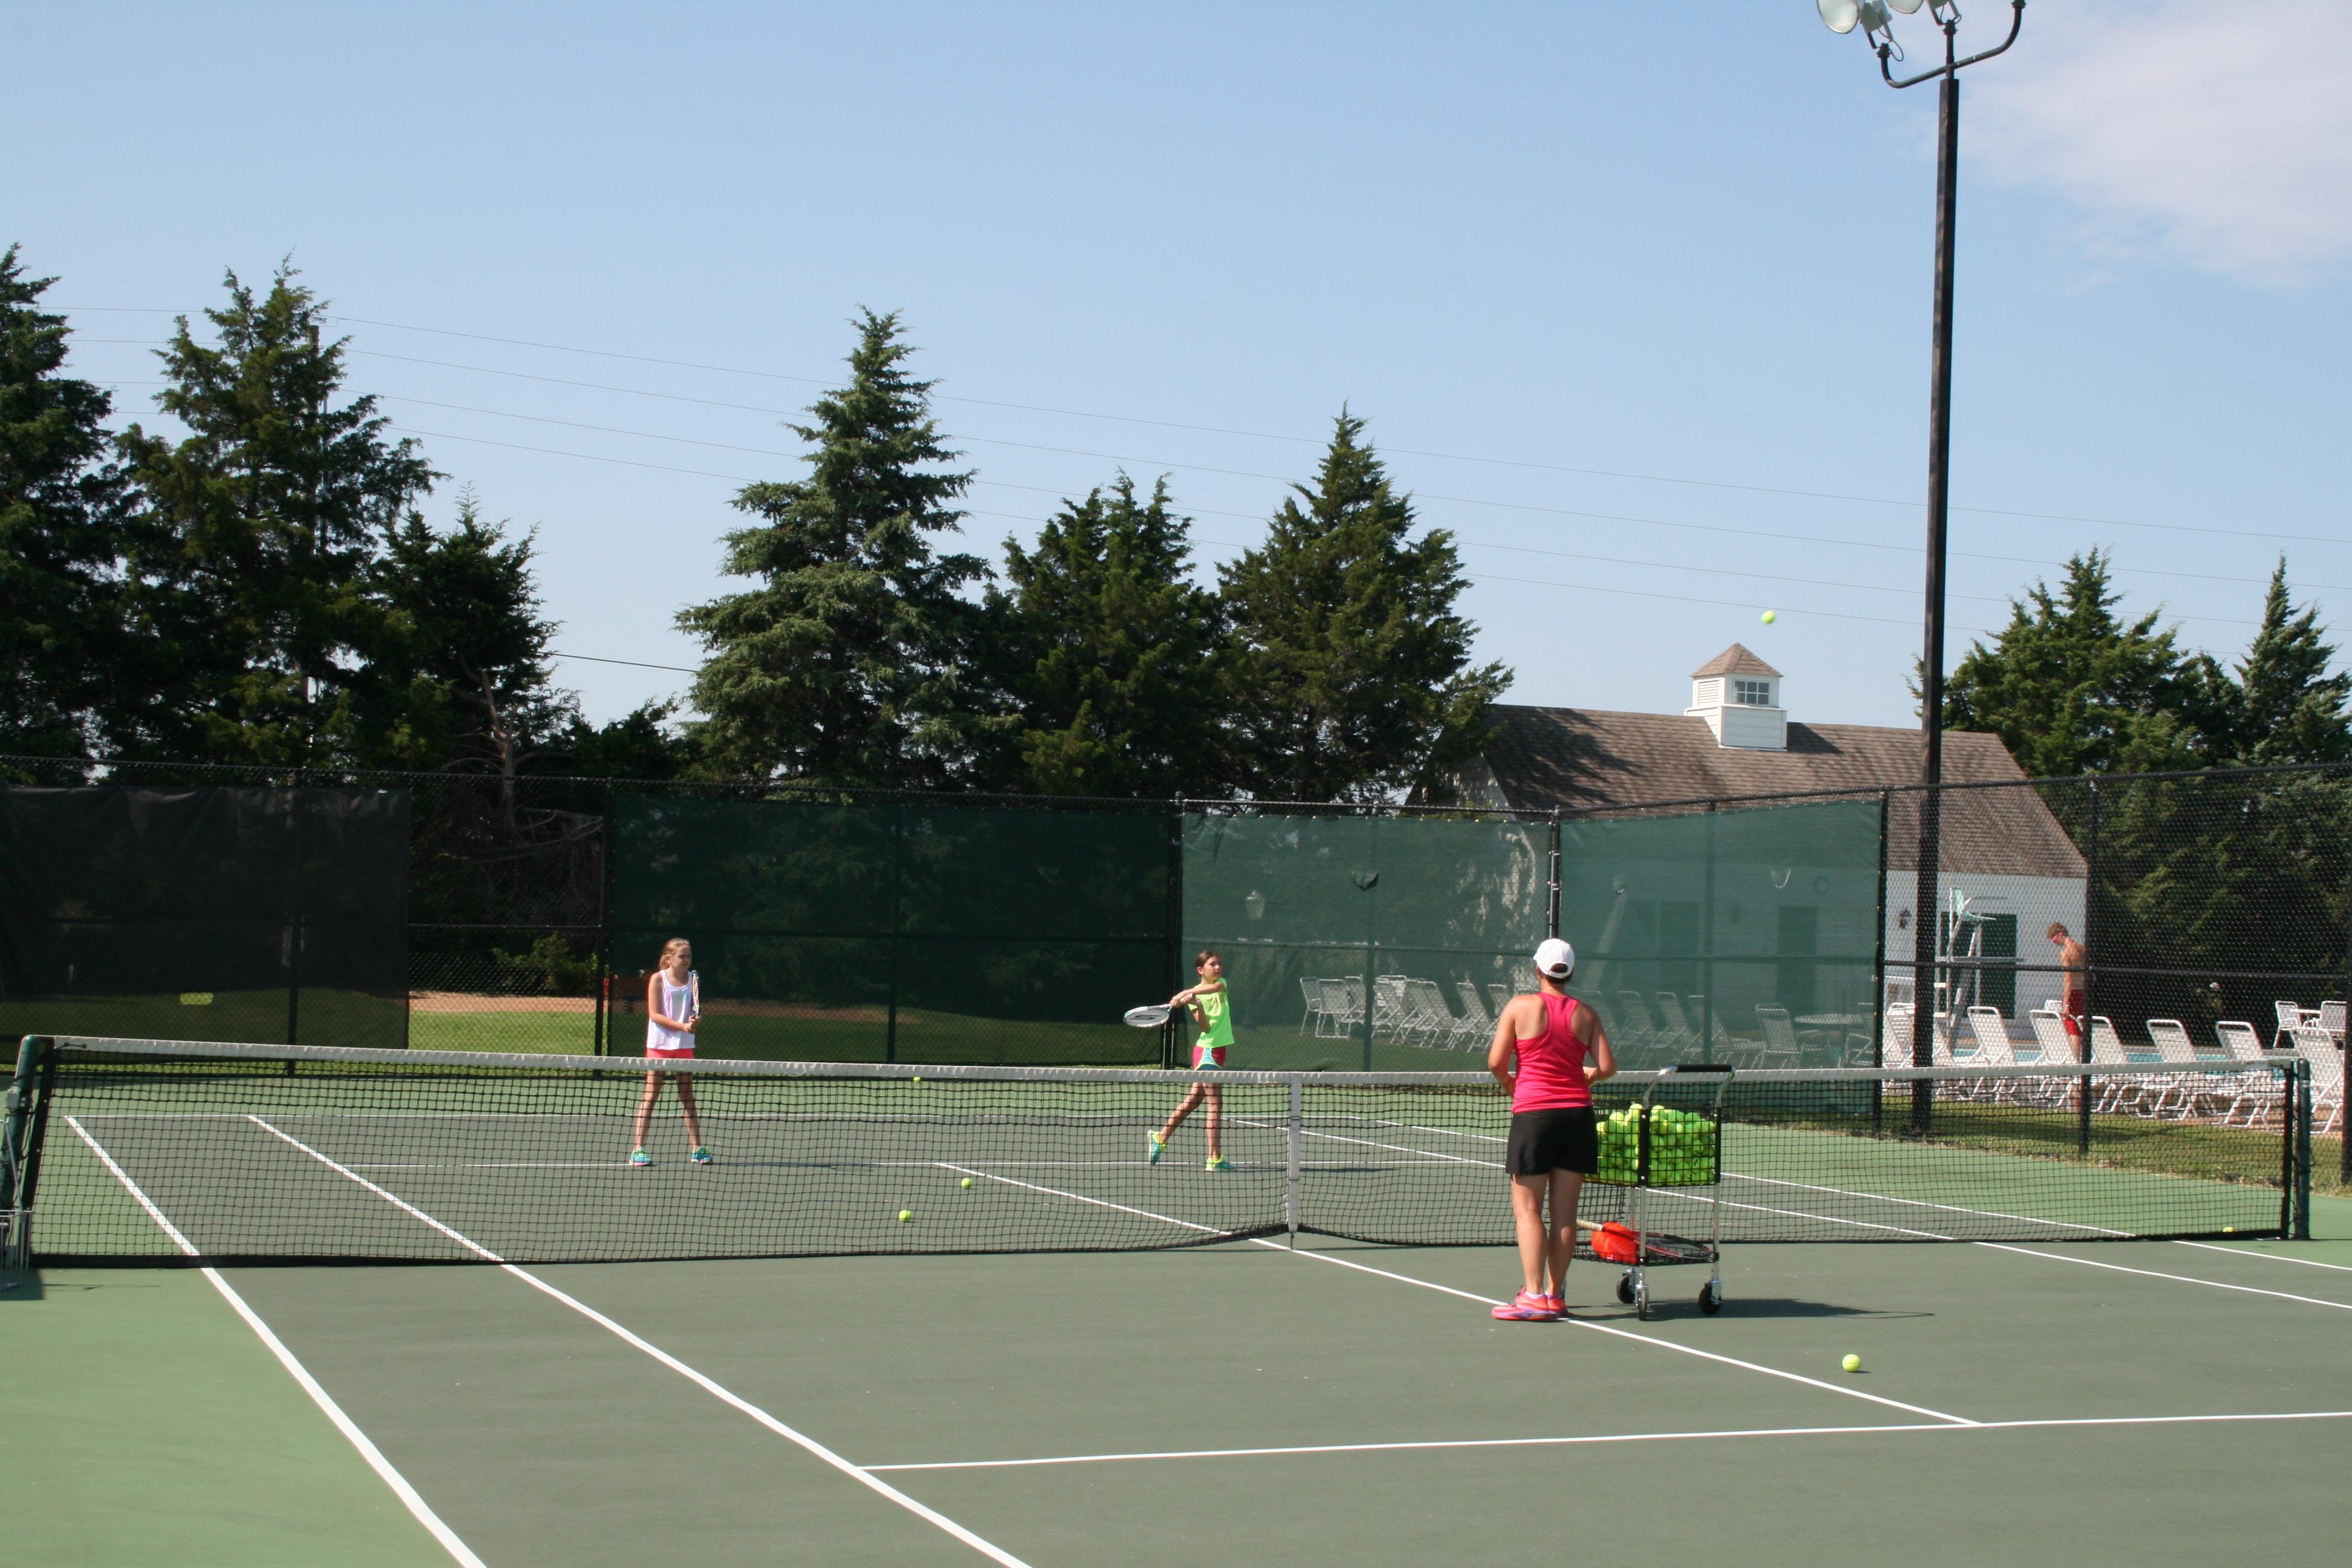 Forest Ridge Swim & Tennis Center image 1